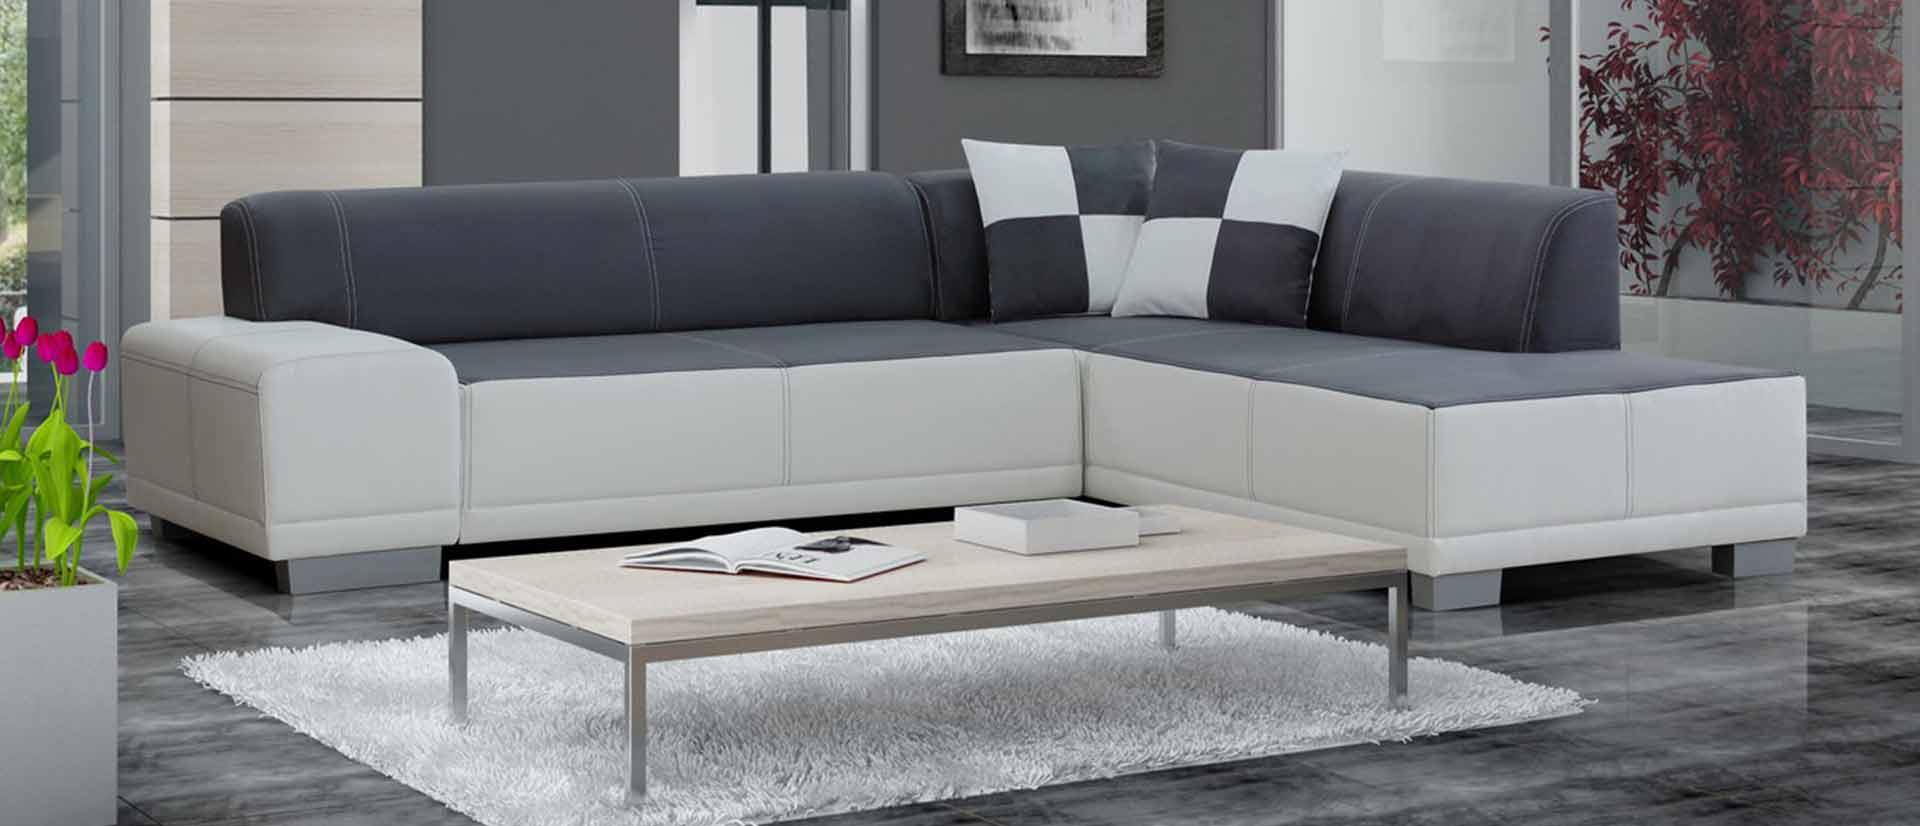 sofas a medida en galicia